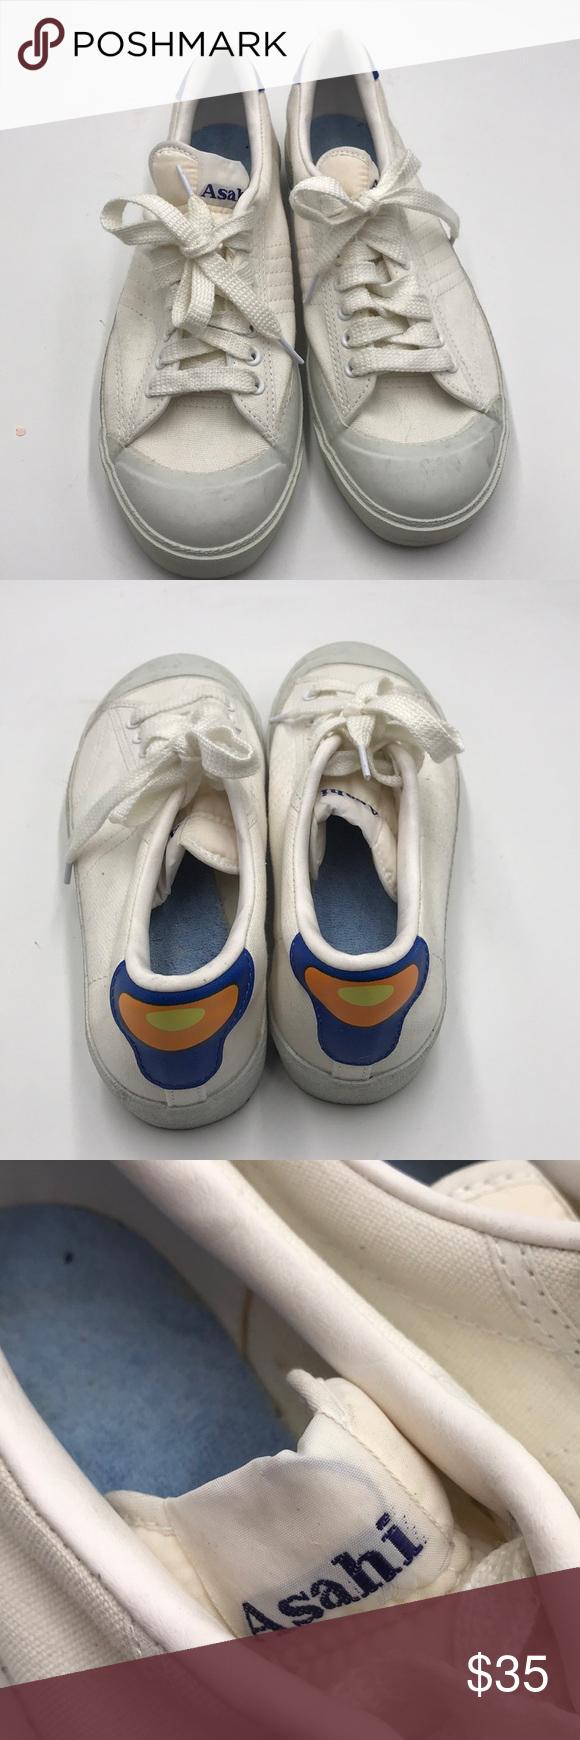 00d2f943de6 Vintage men s ASAHI tennis shoes So great! Like new- vintage! ASAHI Shoes  Sneakers